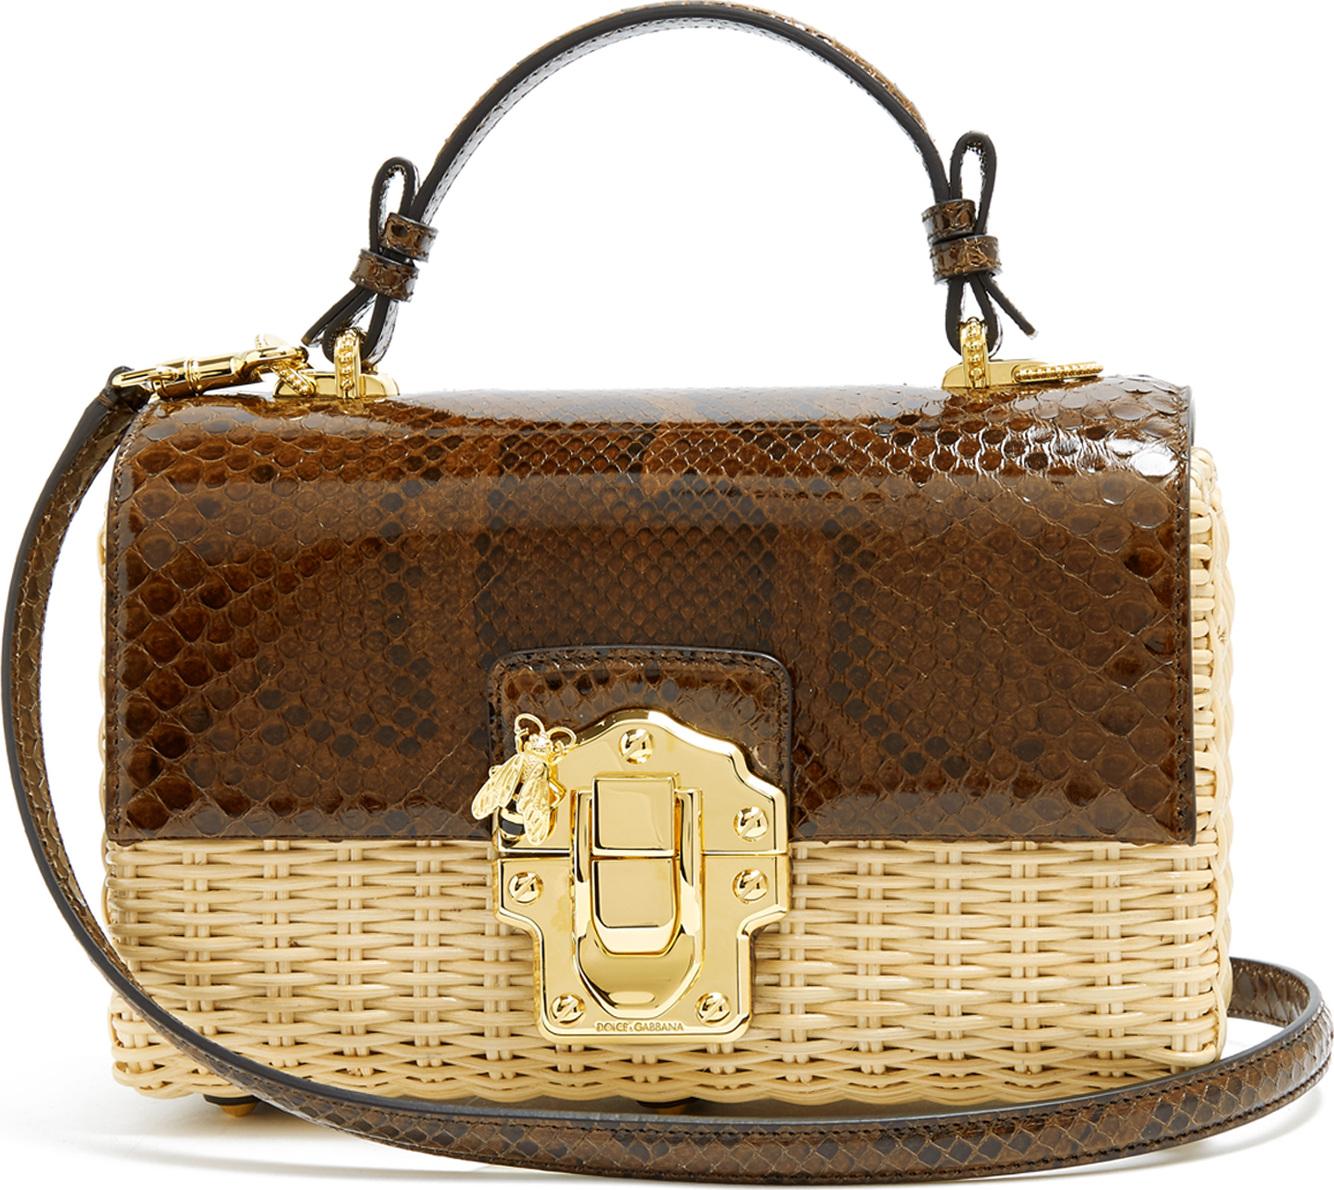 9b2f0d3dc0fc Dolce   Gabbana Lucia python and woven bag - Mkt